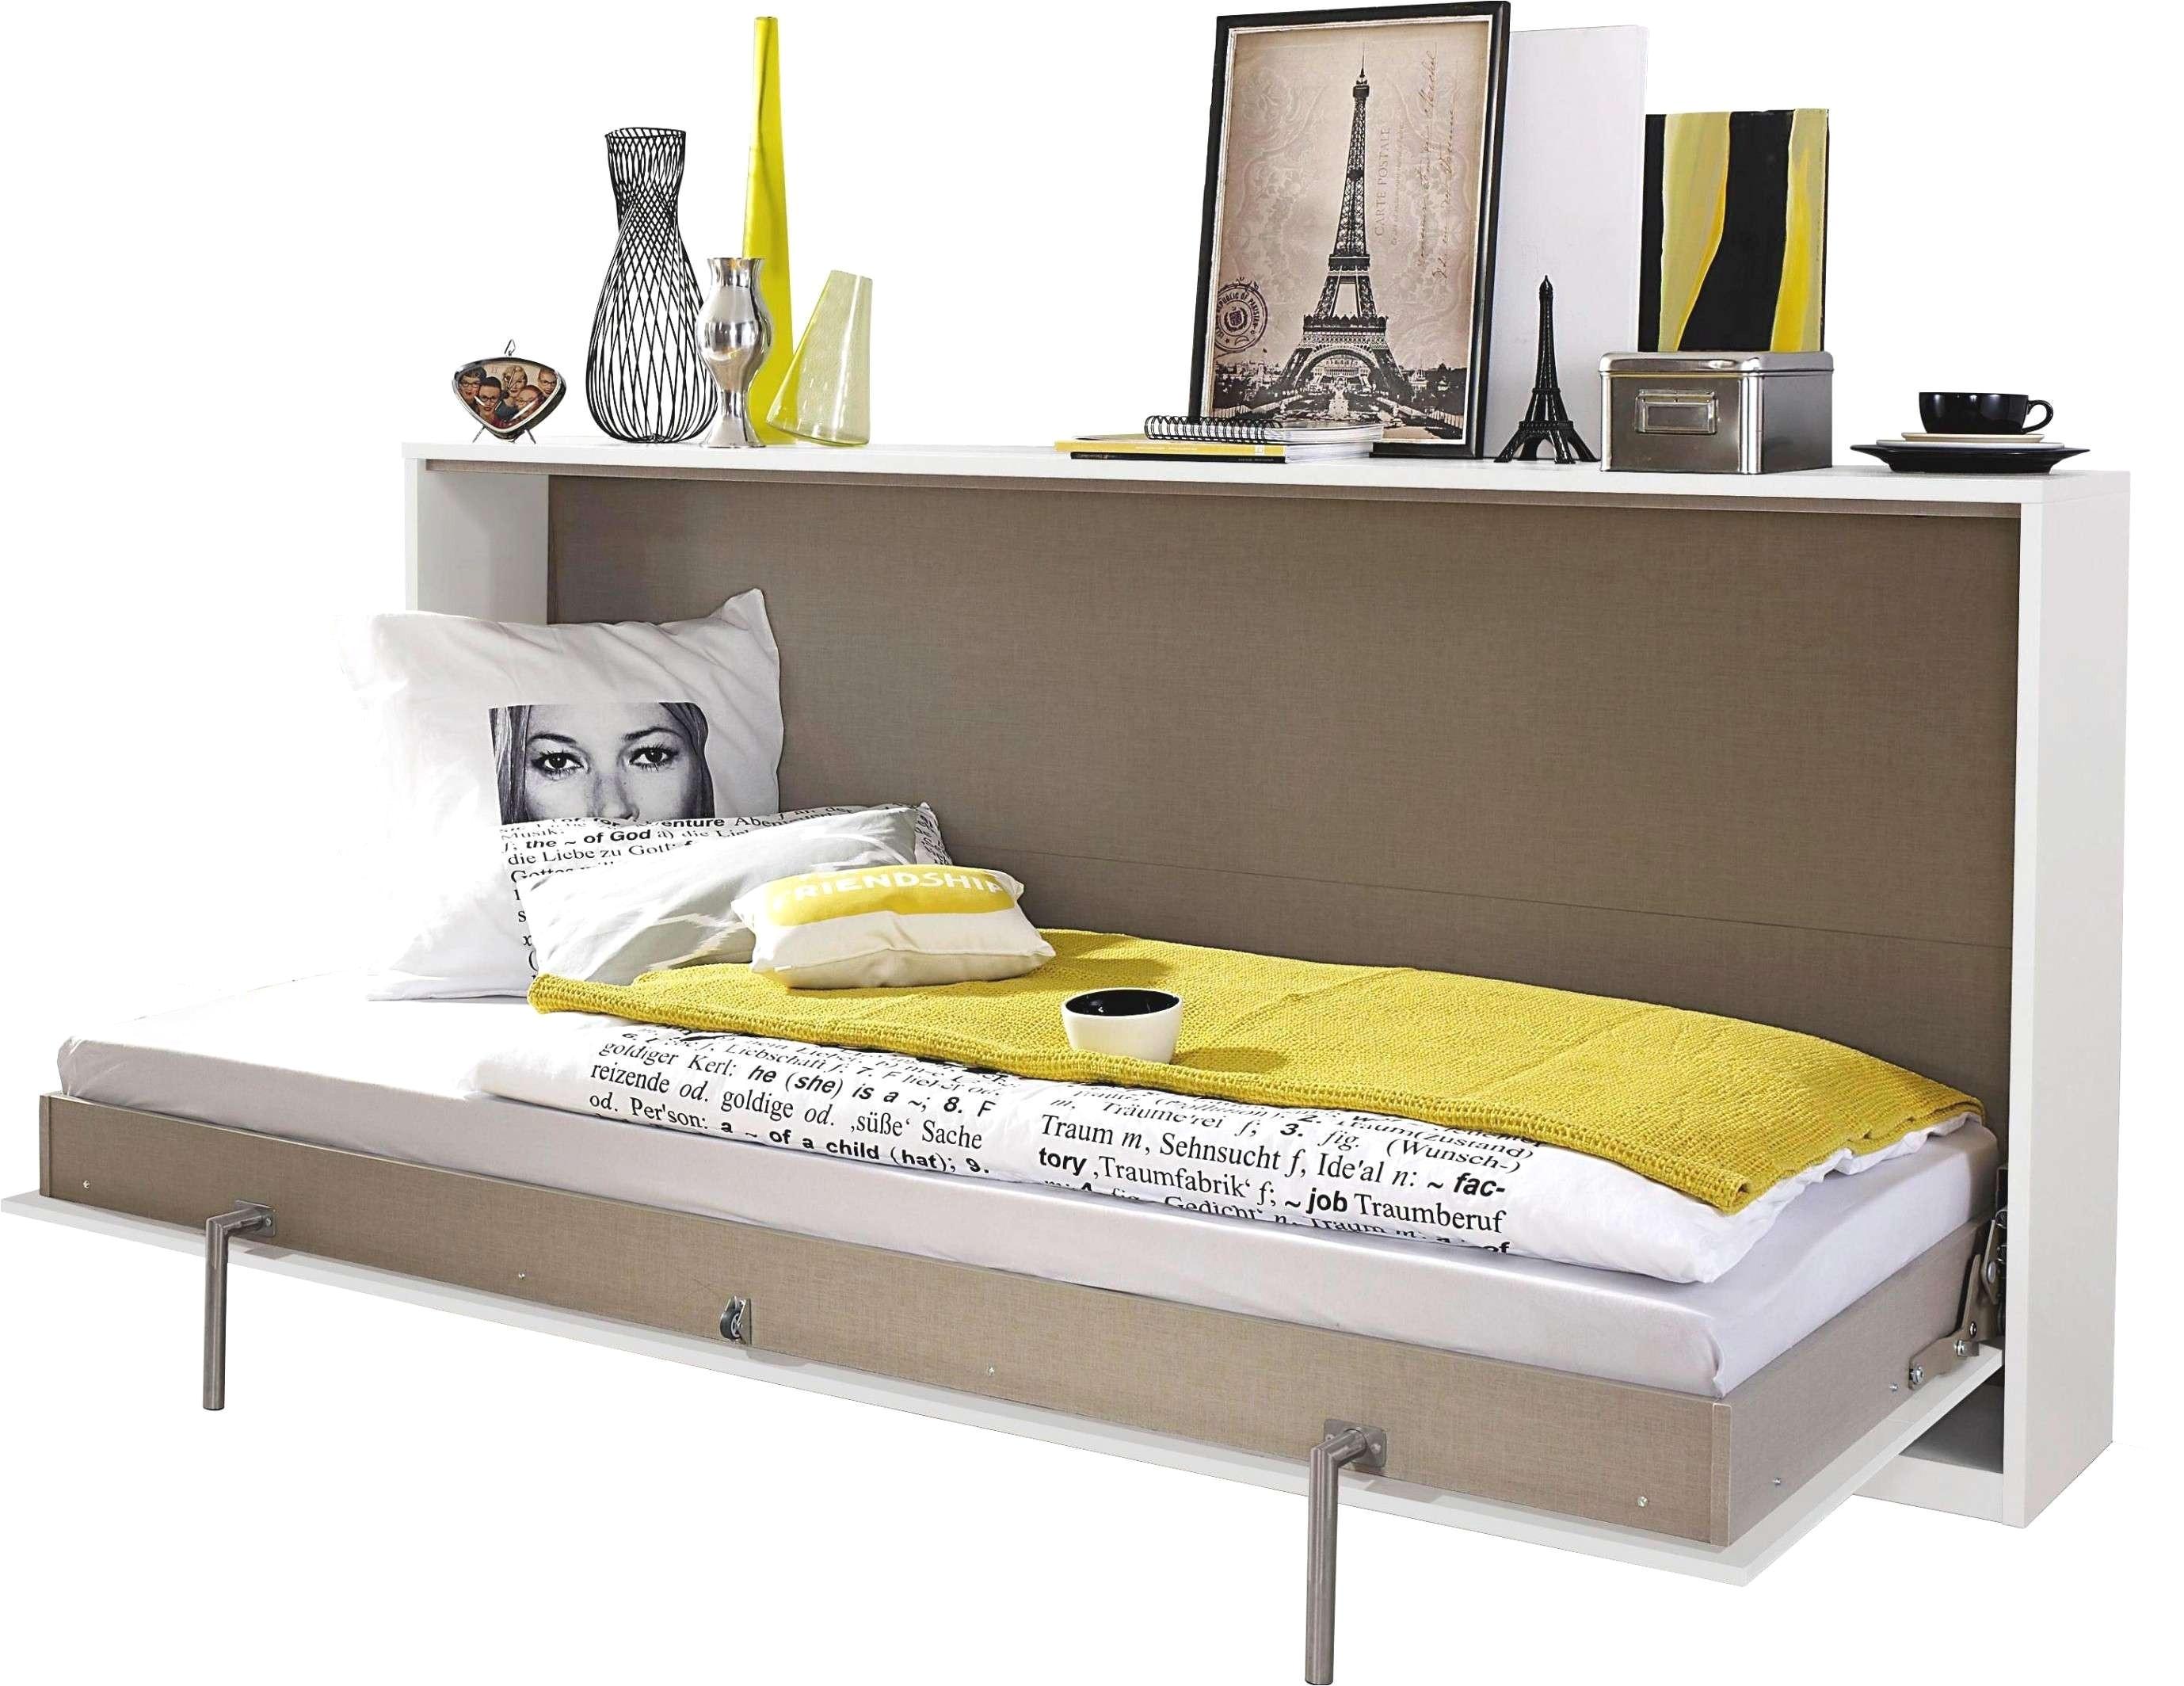 Review Of Ikea Memory Foam Mattress Ikea Matras Morgedal Luxe Wunderbar Morgedal Matratze Erfahrung